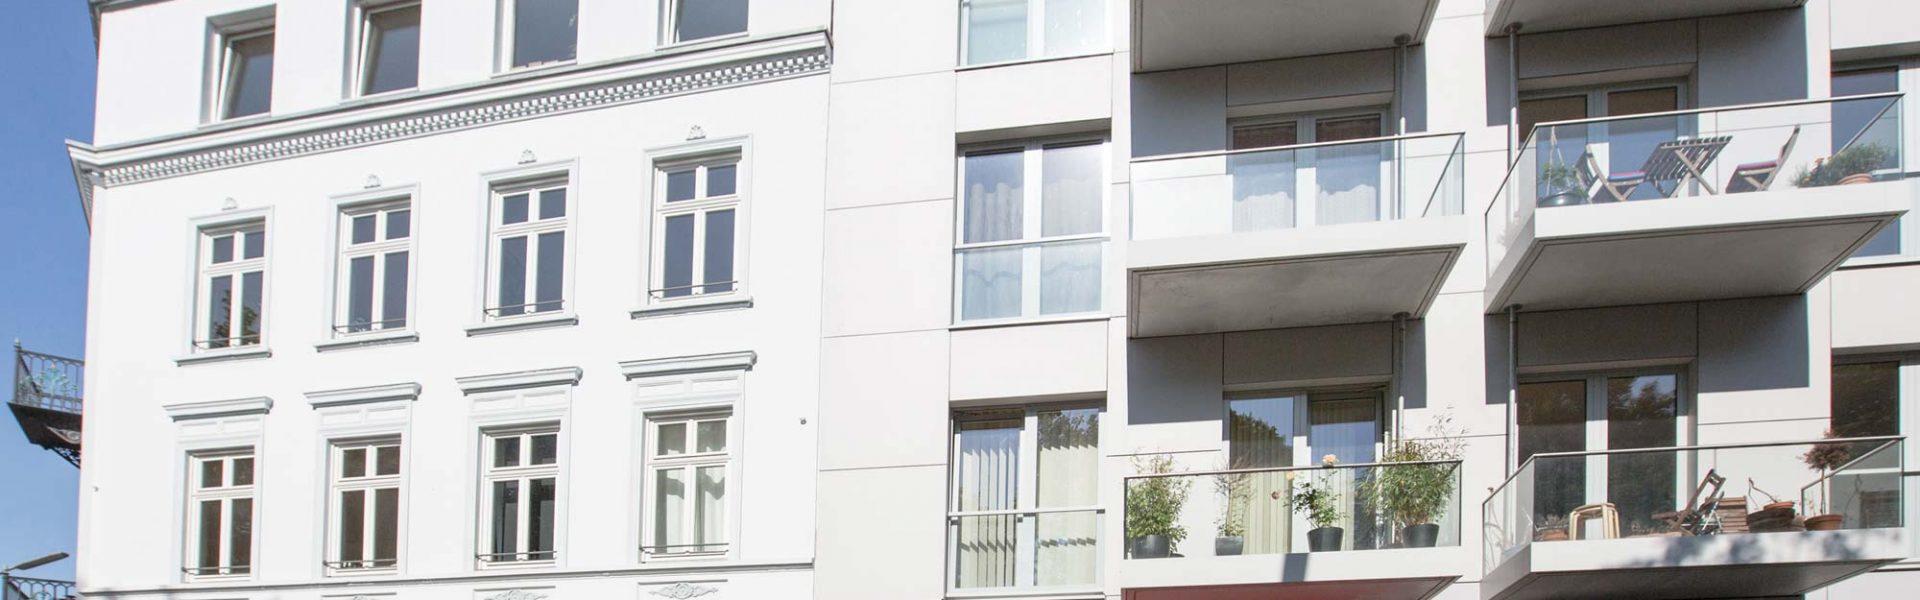 Thadenstraße 4, Hamburg